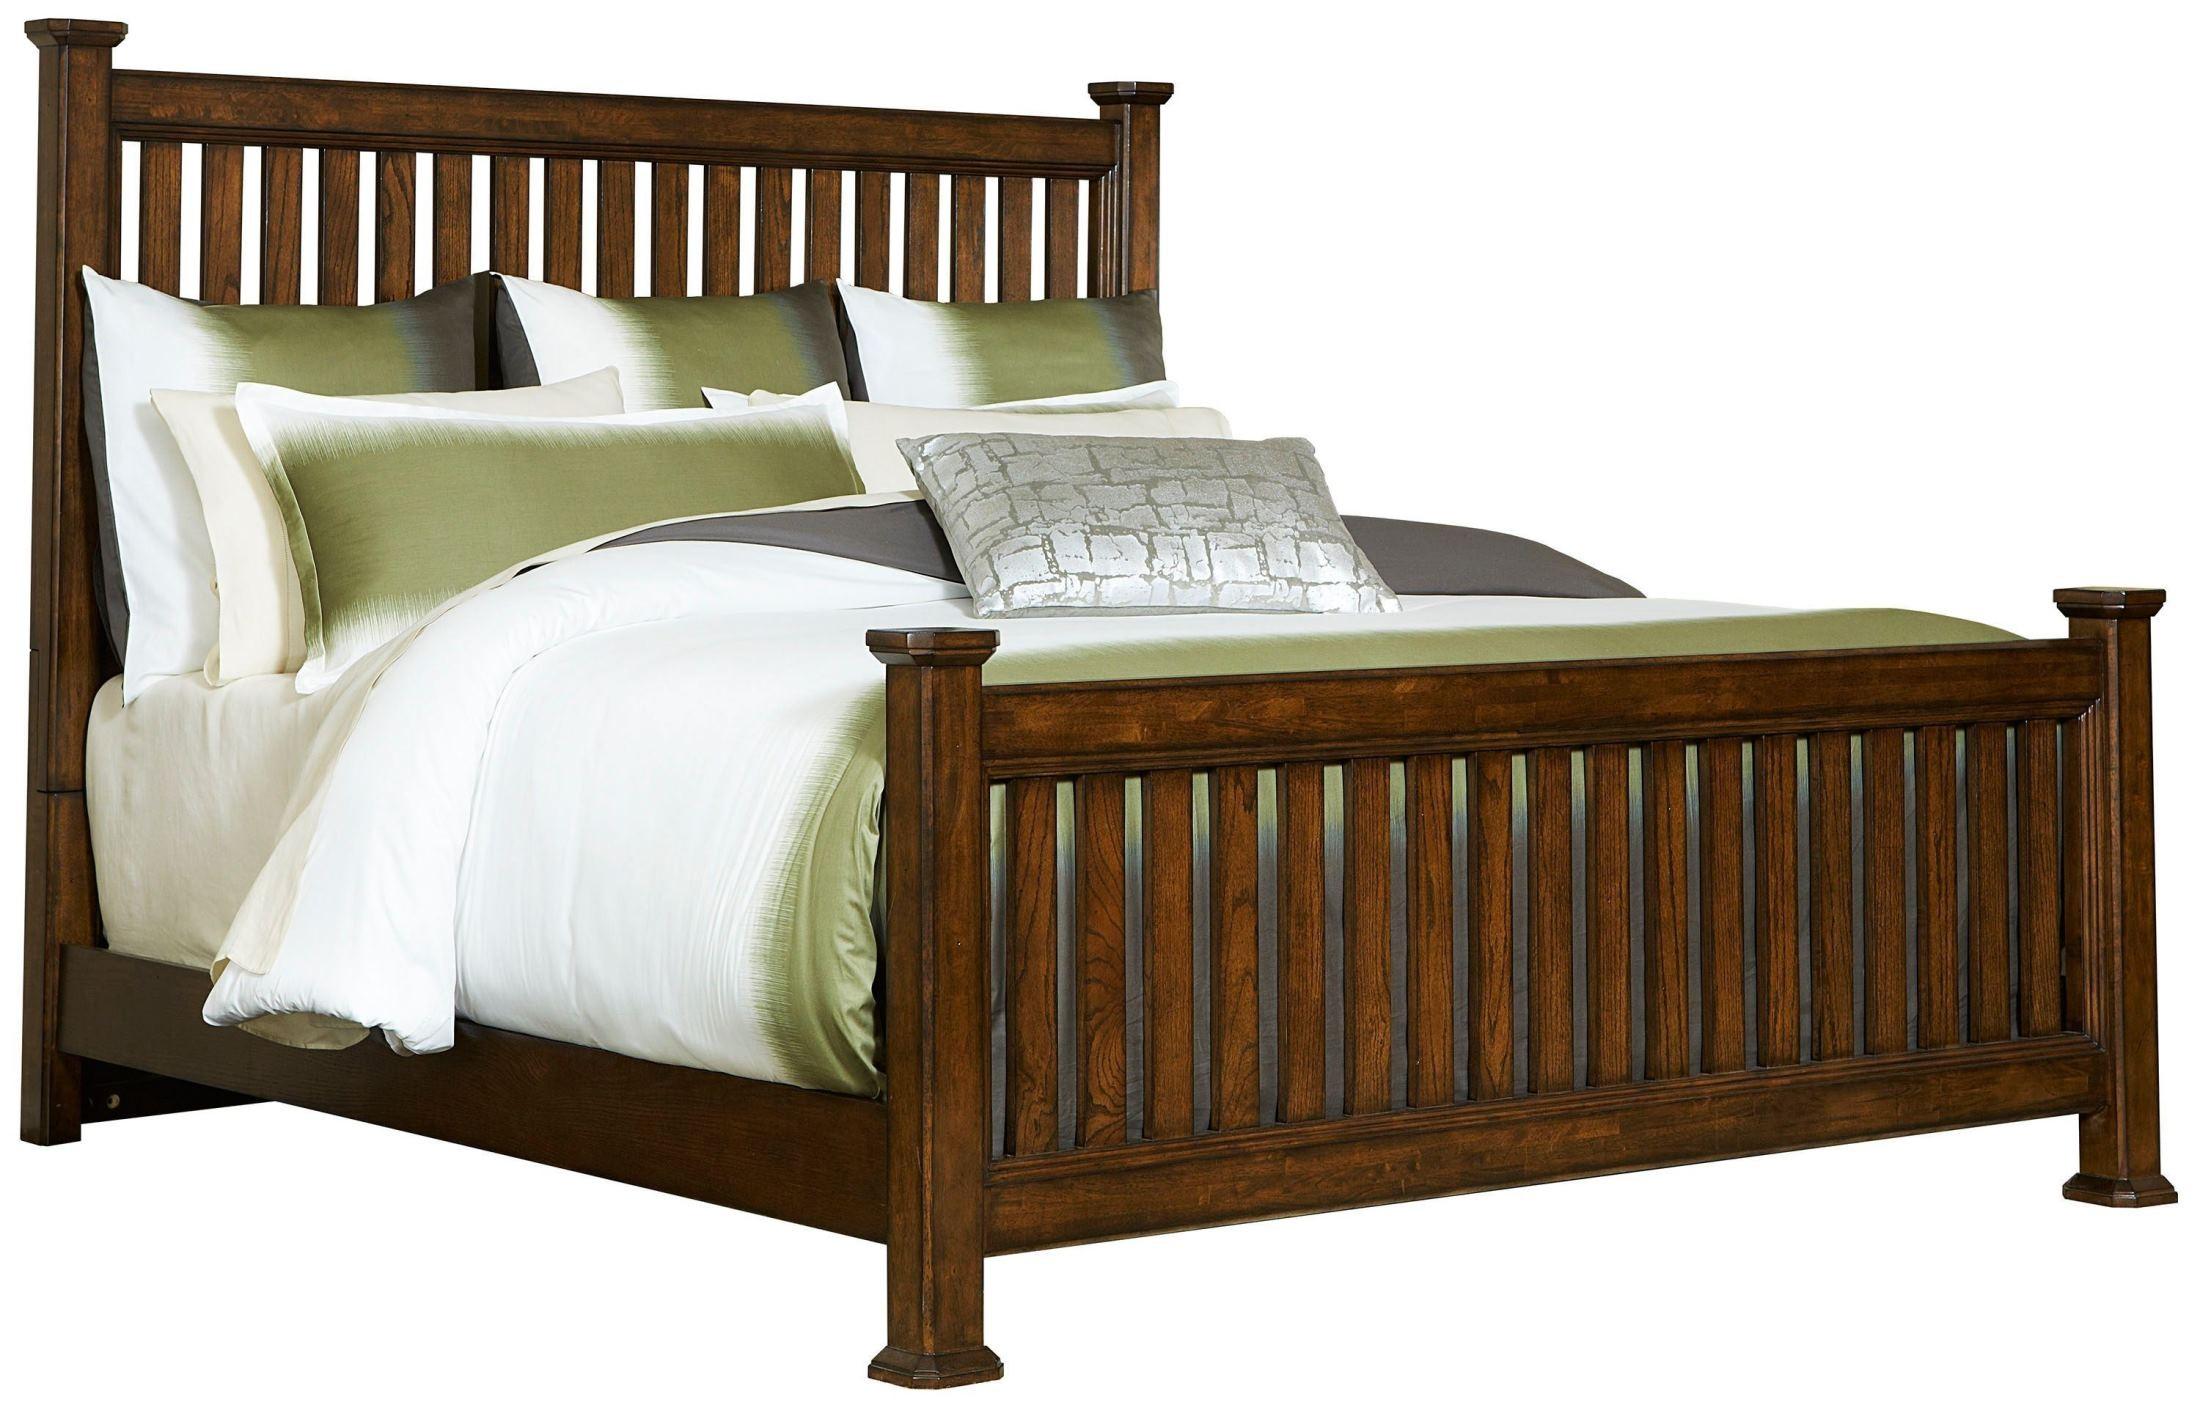 estes park queen slat poster bed from broyhill 4364 260 261 460 coleman furniture. Black Bedroom Furniture Sets. Home Design Ideas